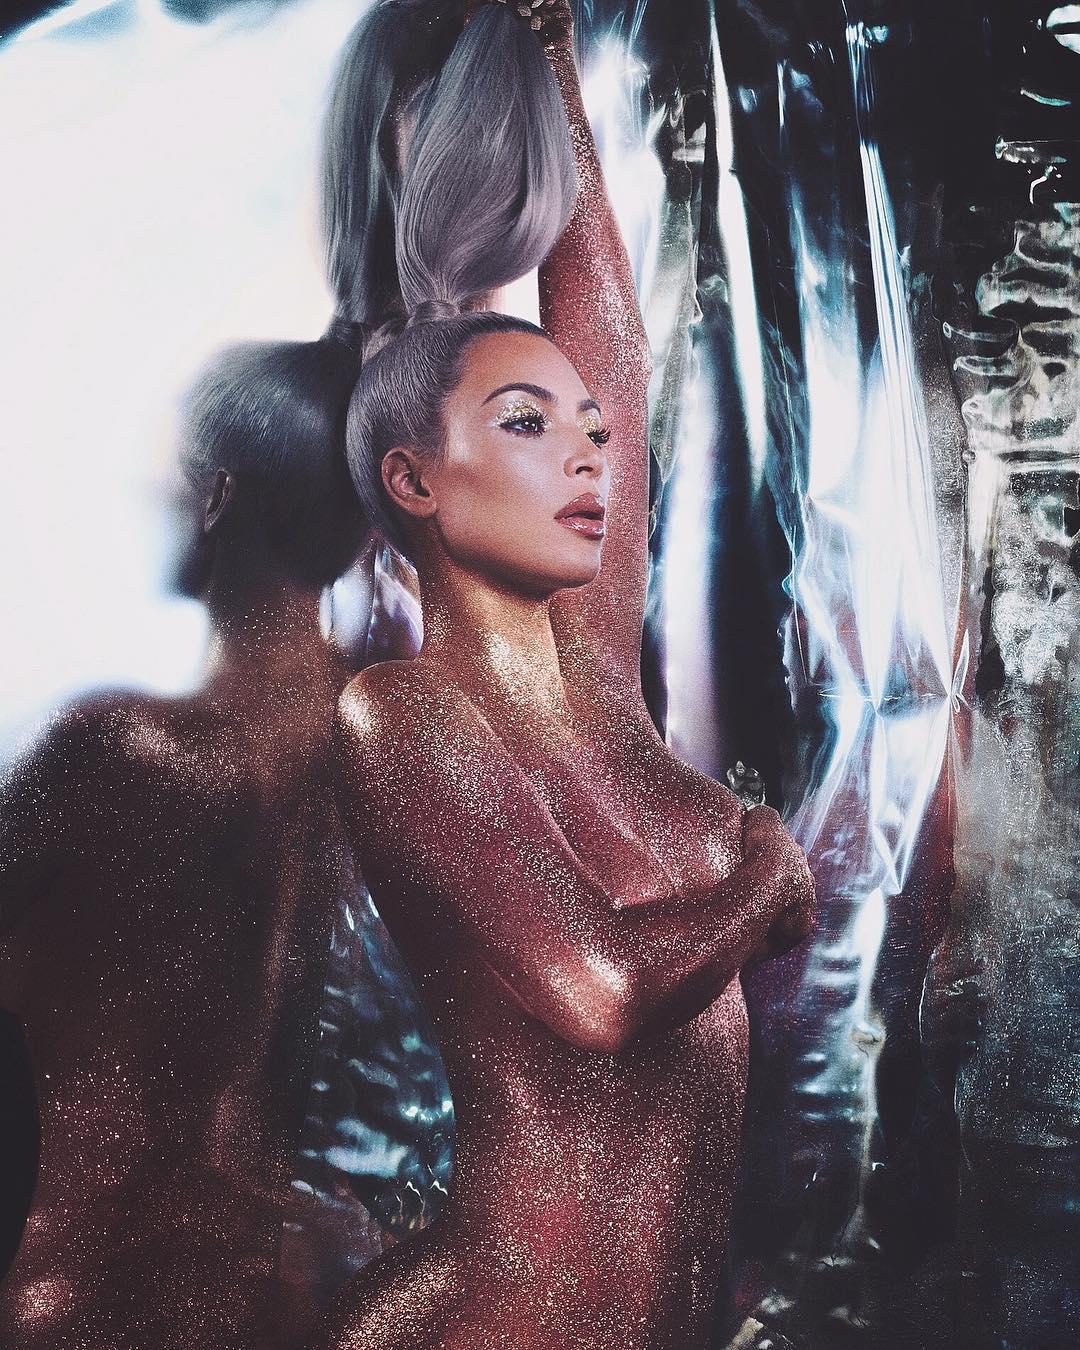 Kim Kardashian KKW Beauty Glitter Photo Shoot